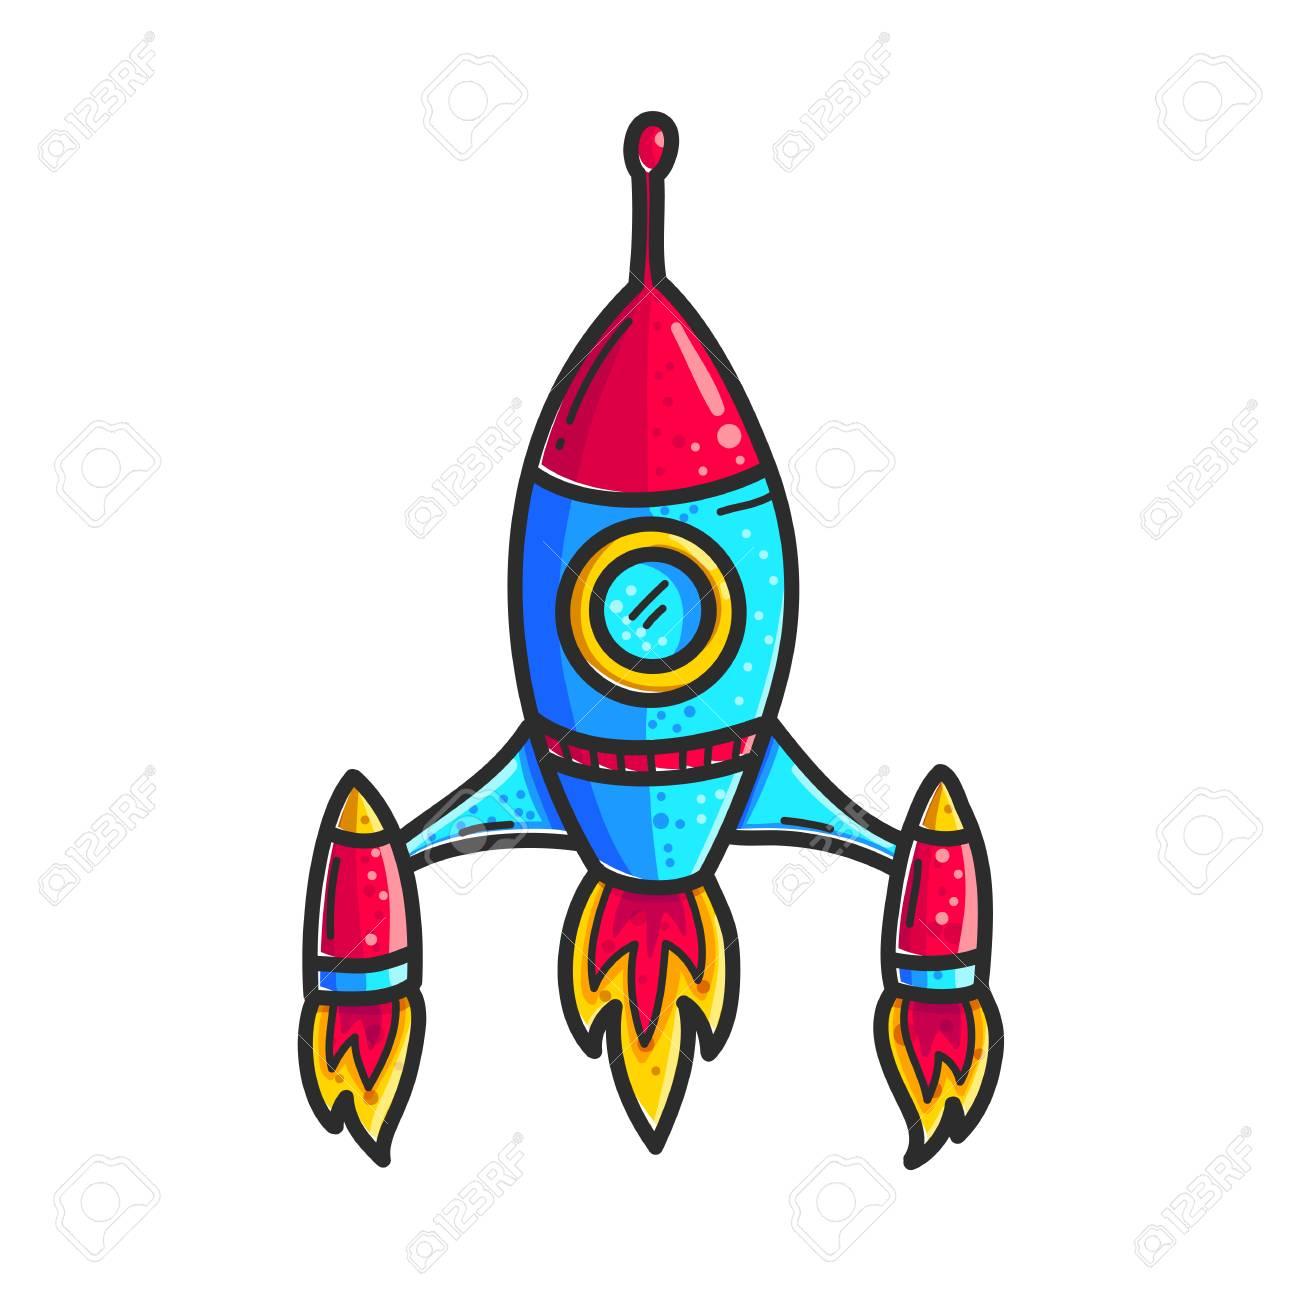 Cartoon rockets hand drawn color icon. Cute space shuttle clipart.